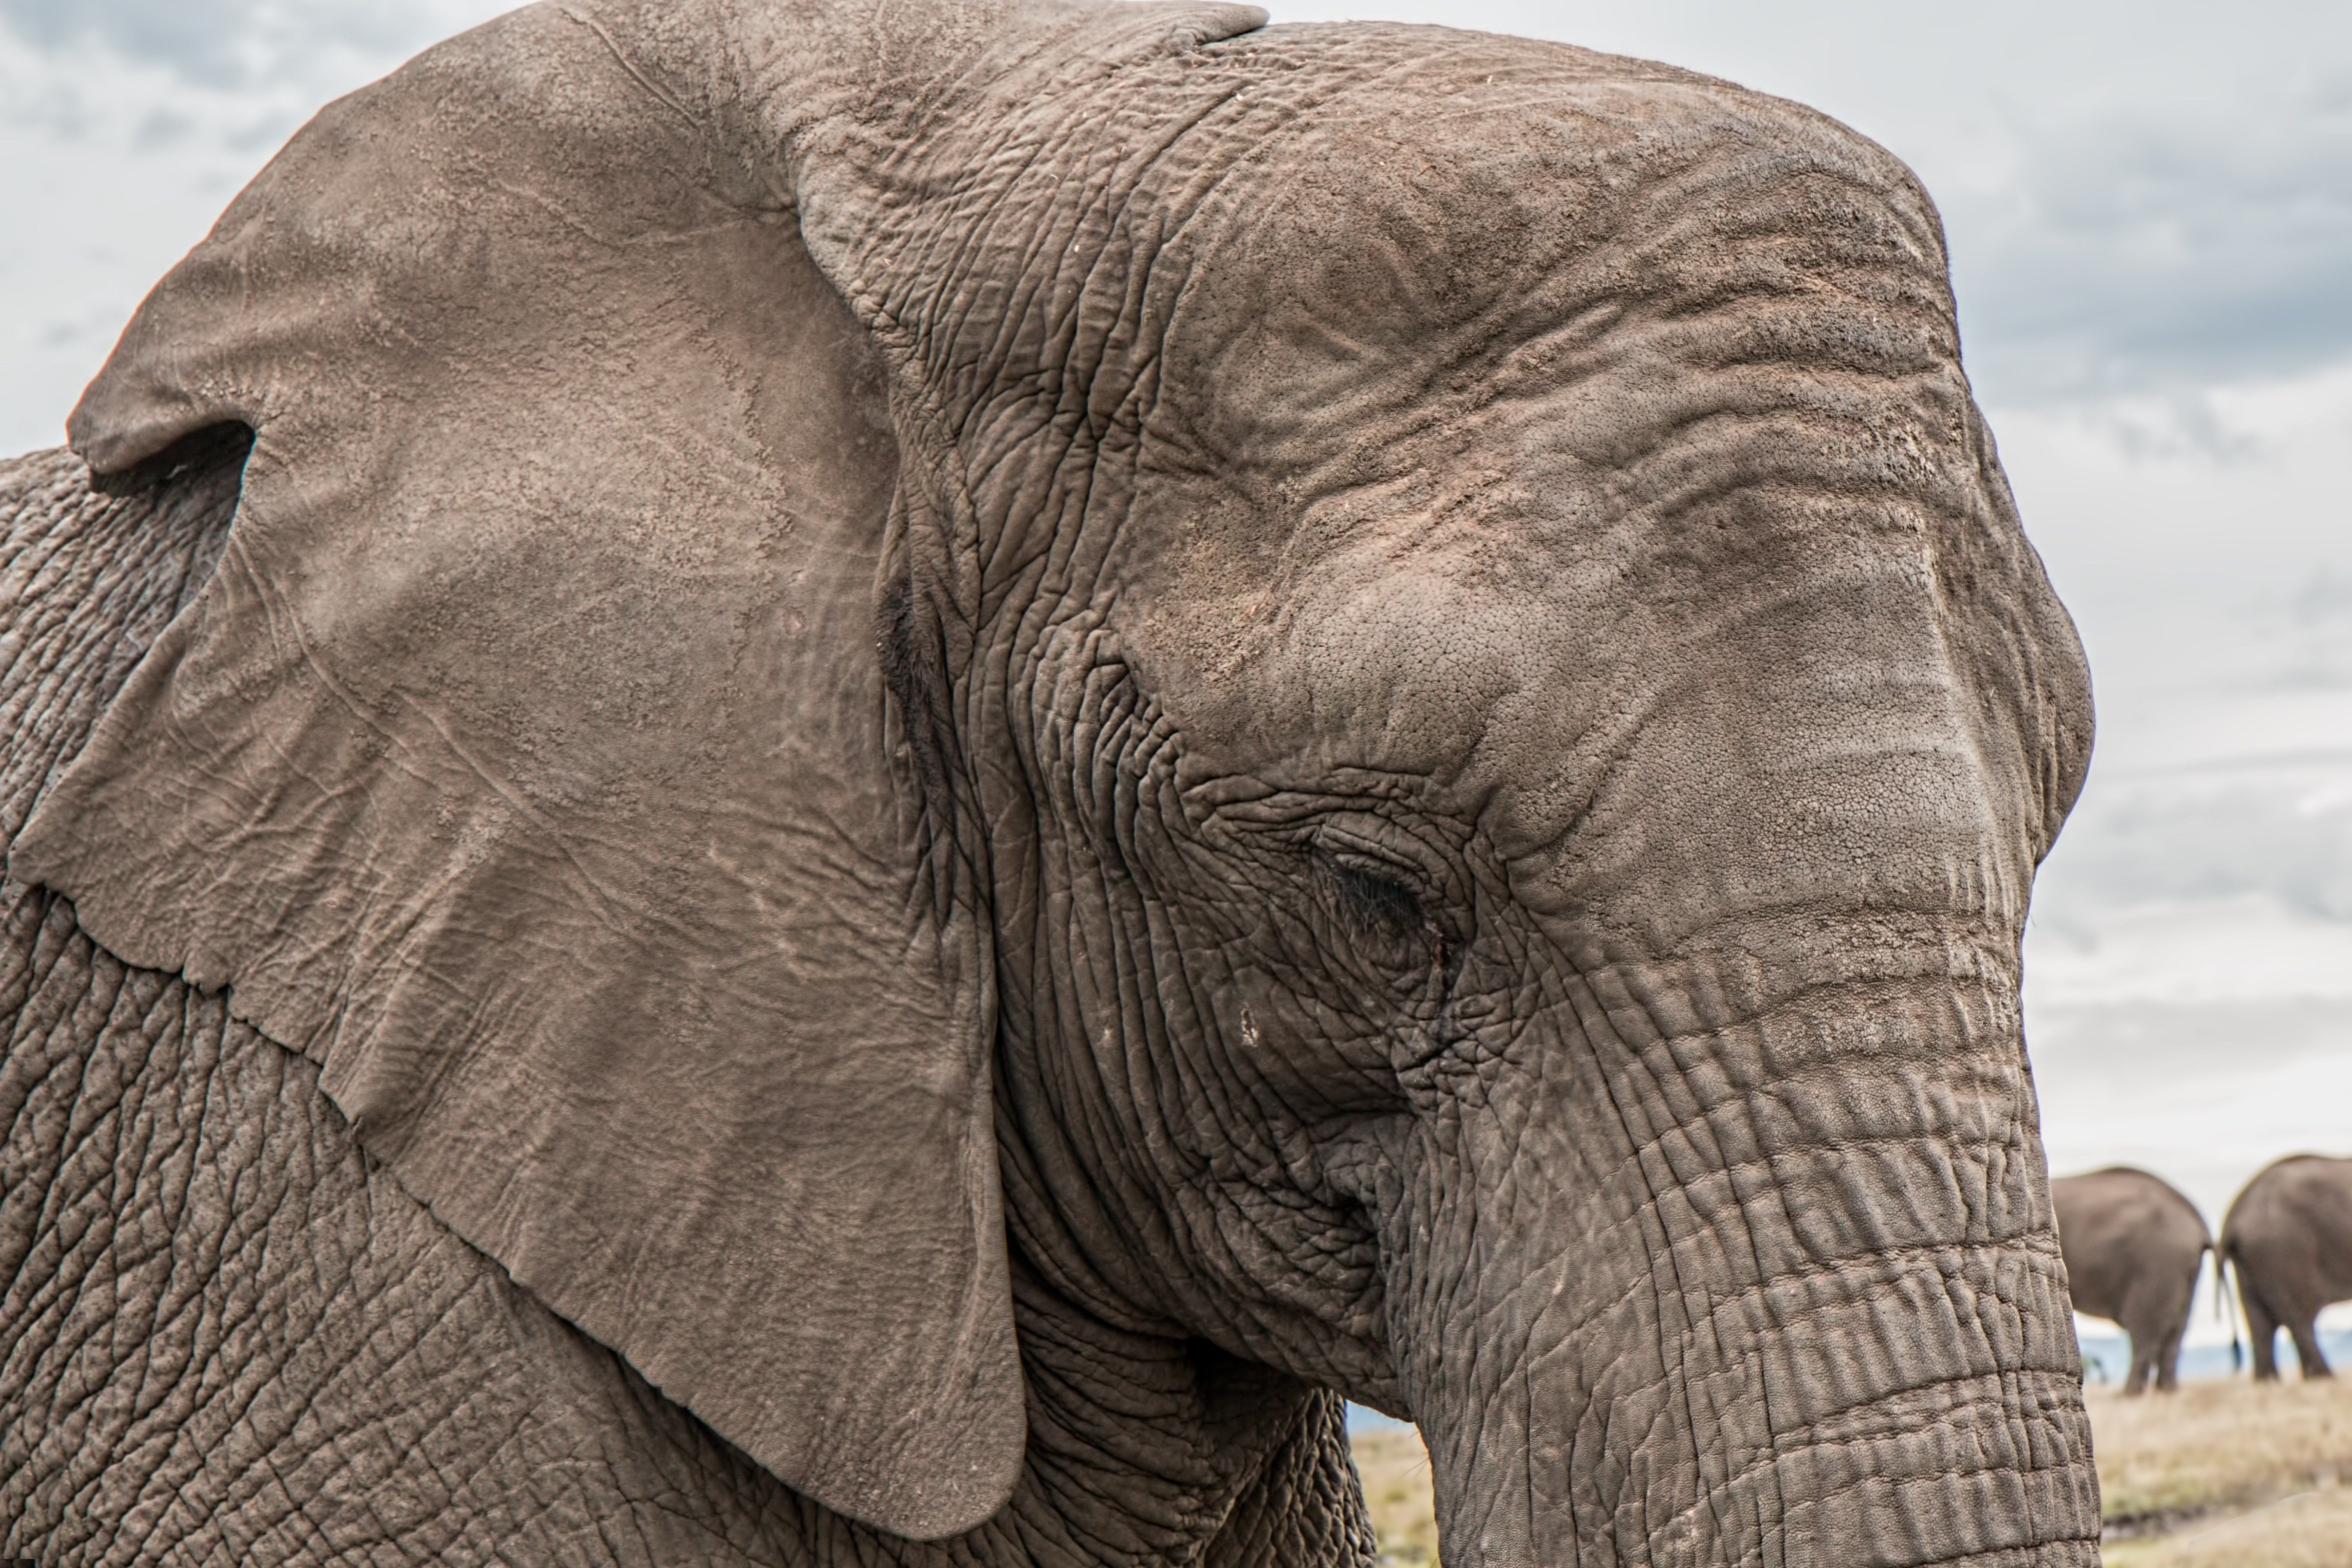 Must see Wallpaper High Quality Elephant - 078f64d999590db7ac5396824b60222c  Pic_463961.jpg